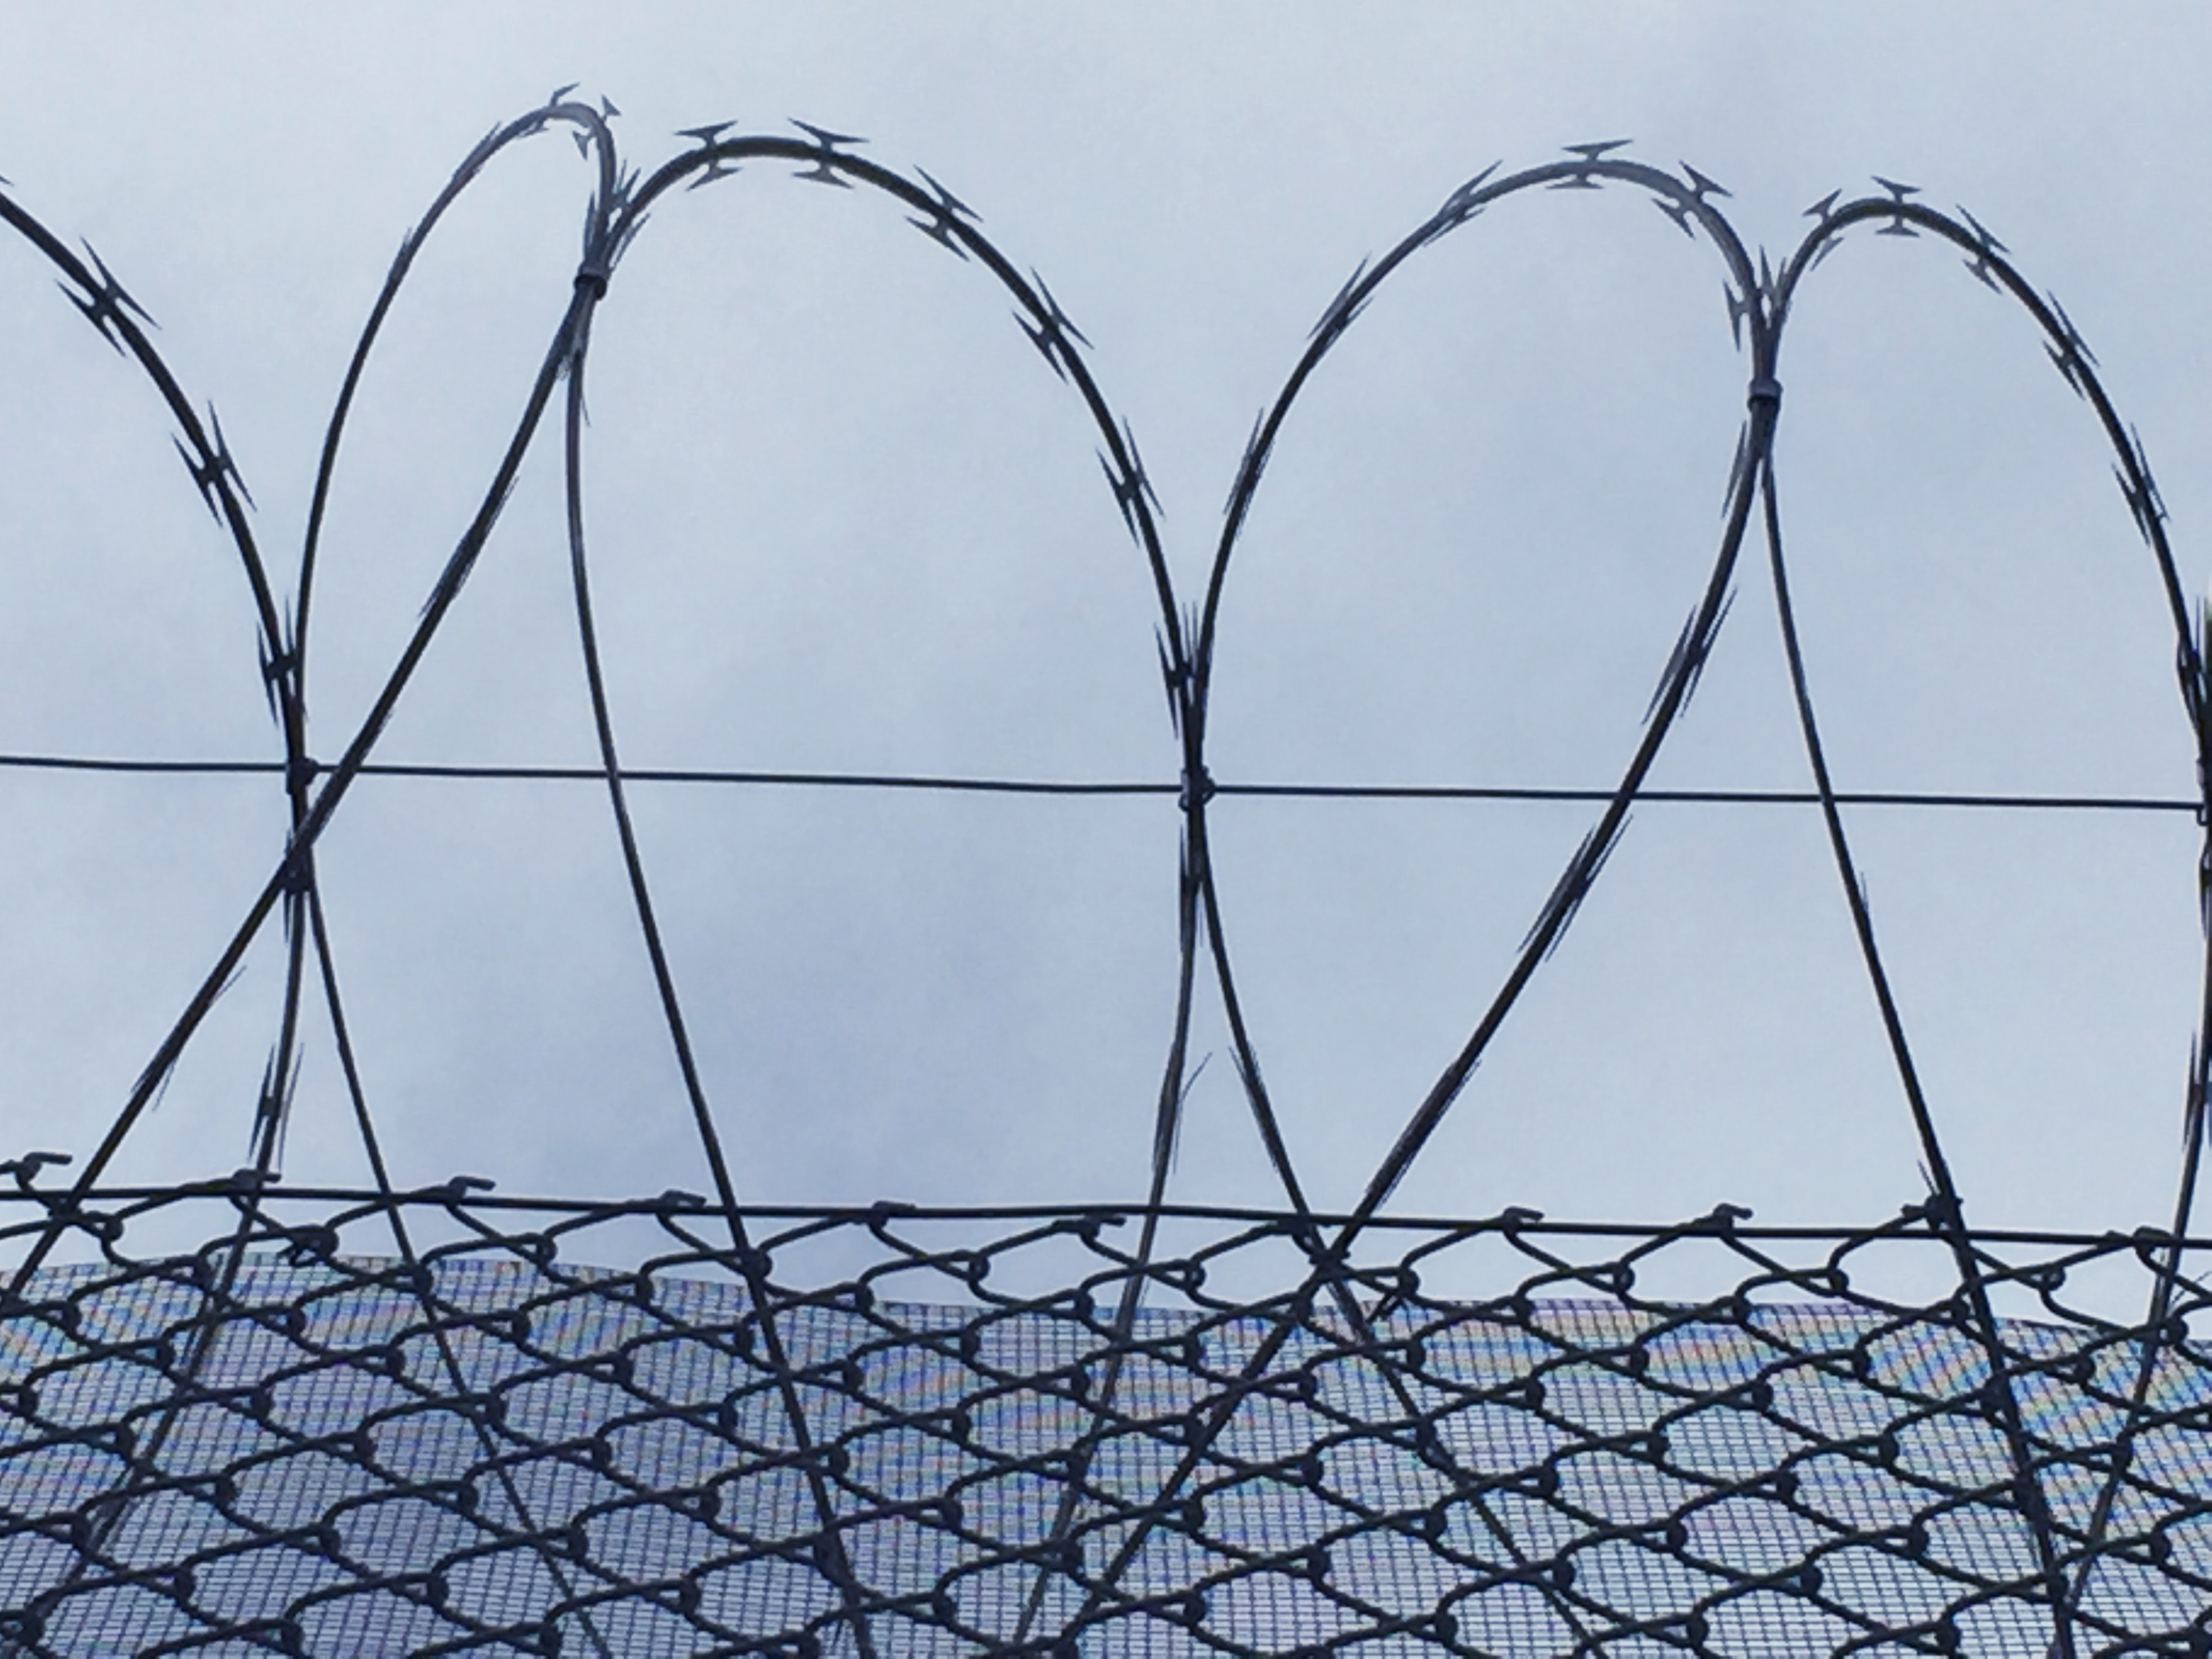 Razor wire heart / Photo by Corri Wells